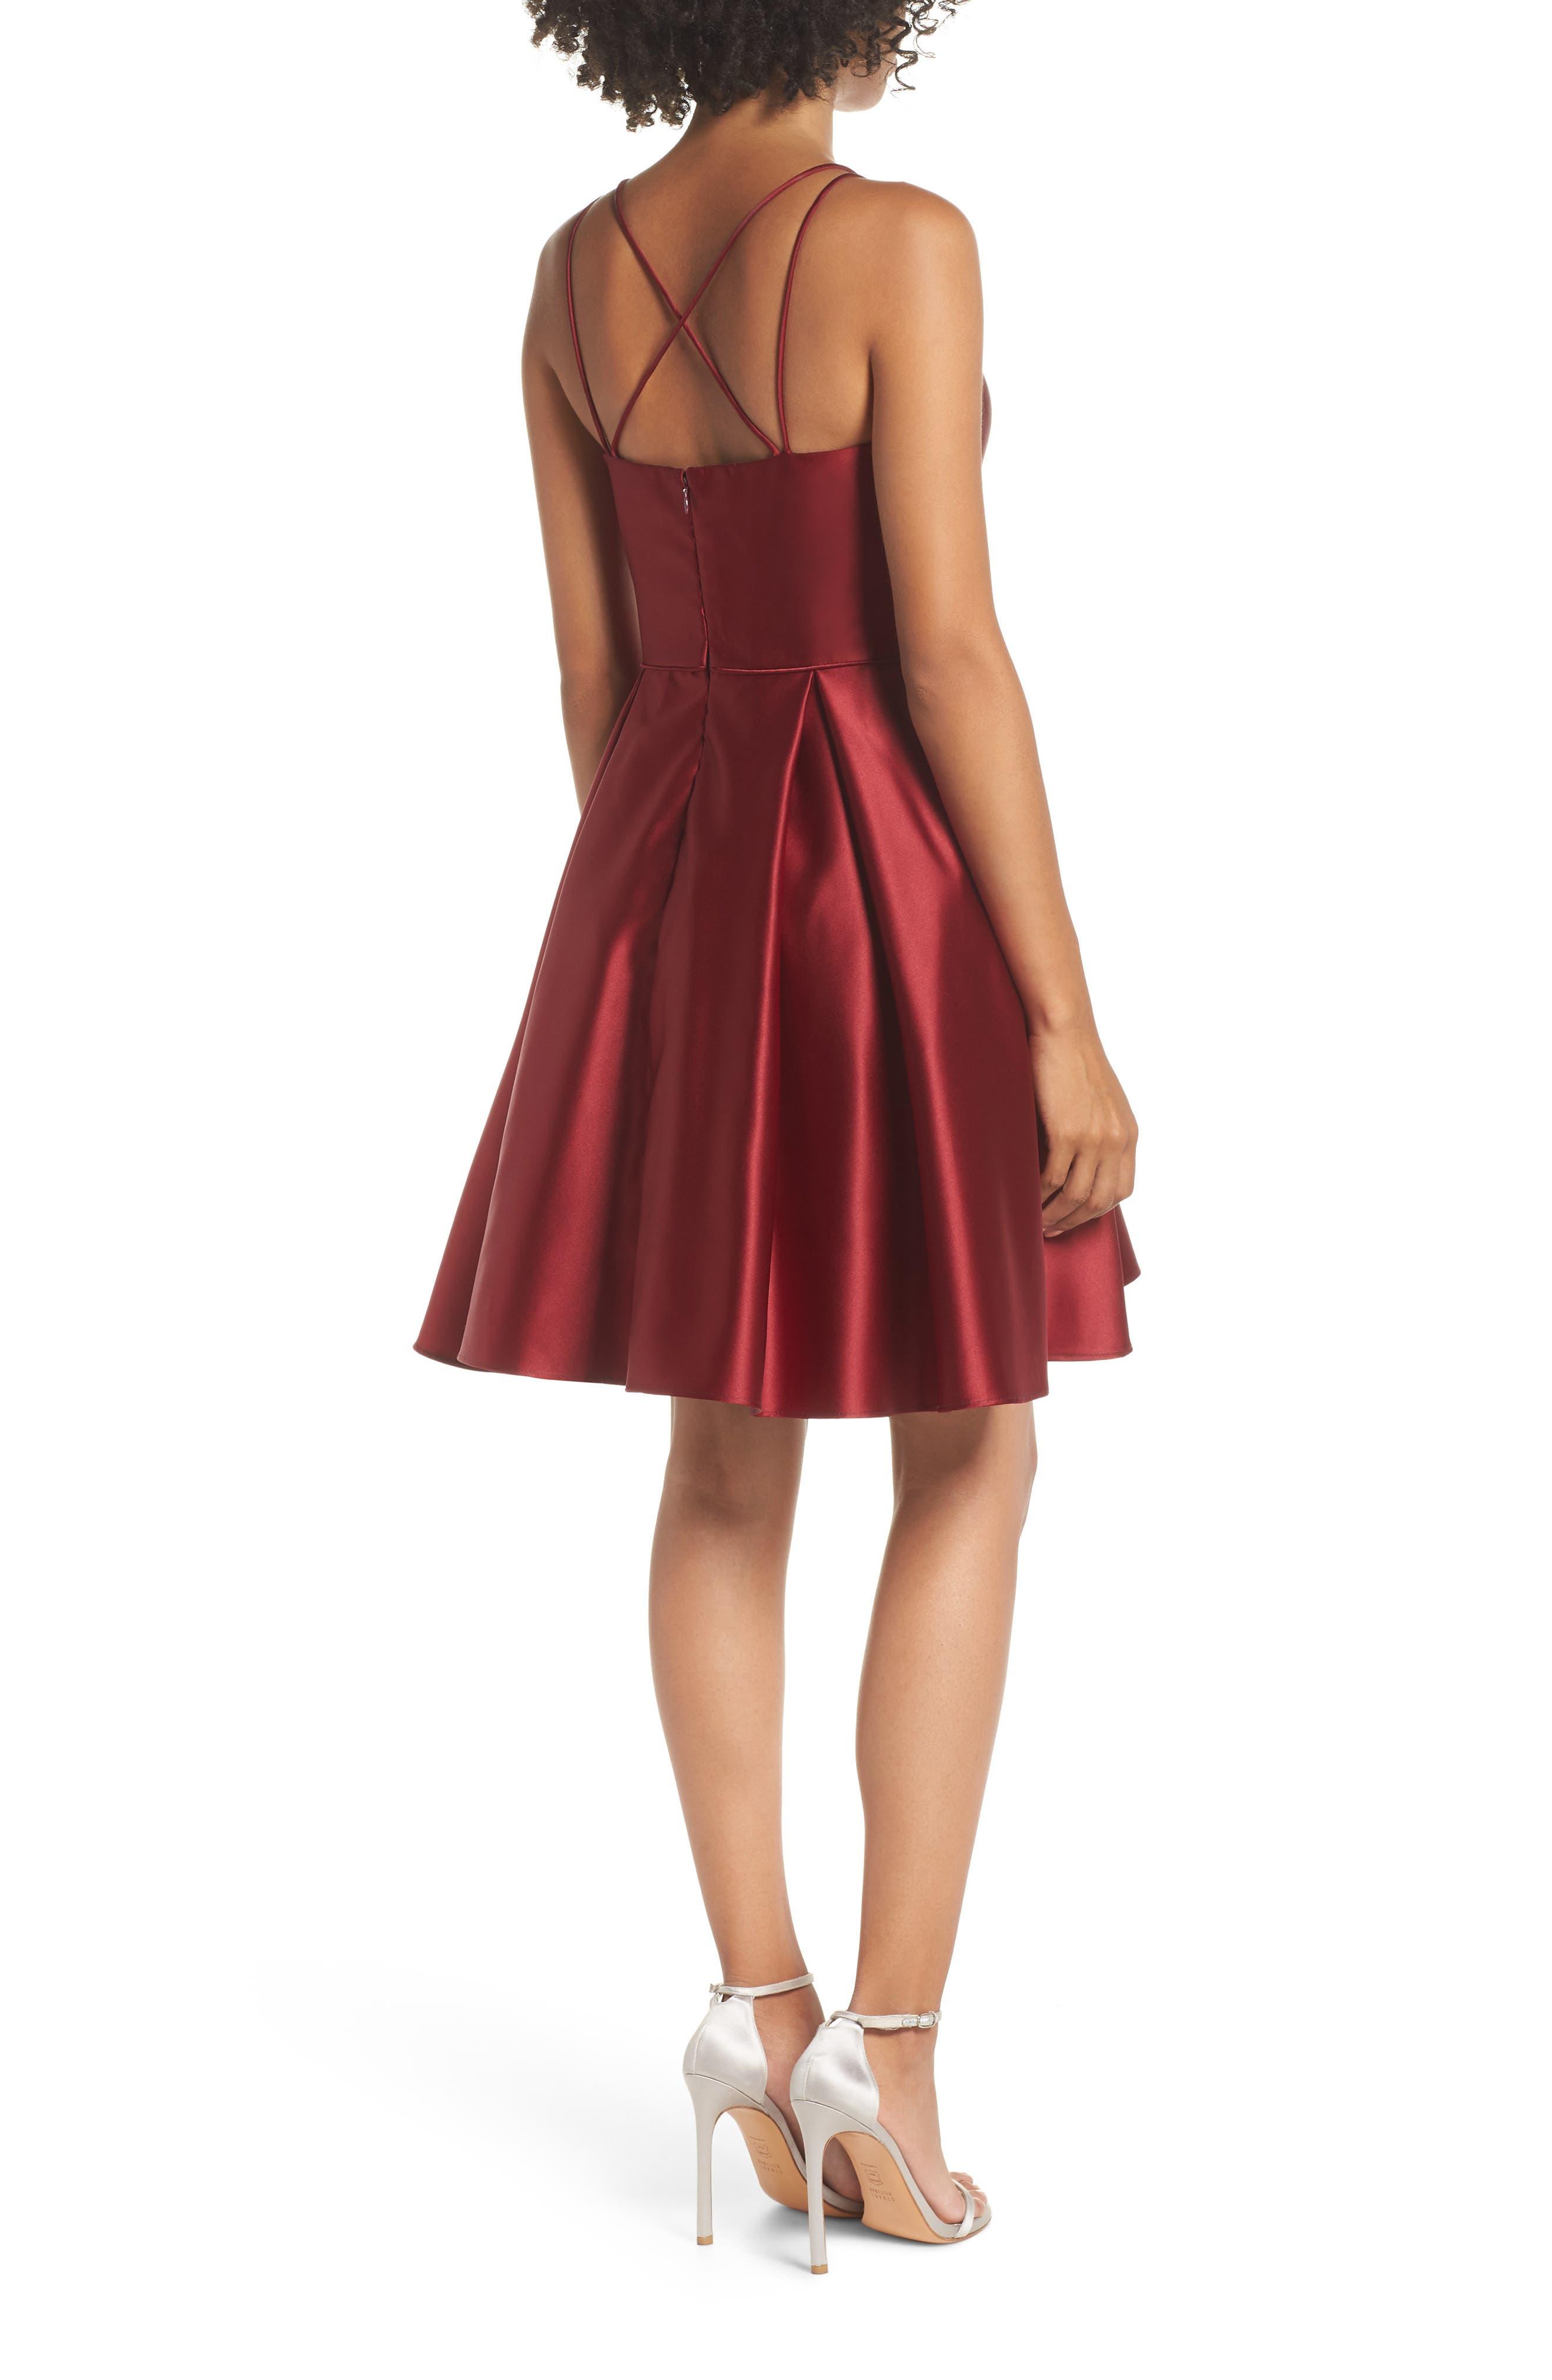 Satin Halter Neck Party Dress,                             Alternate thumbnail 2, color,                             BURGUNDY